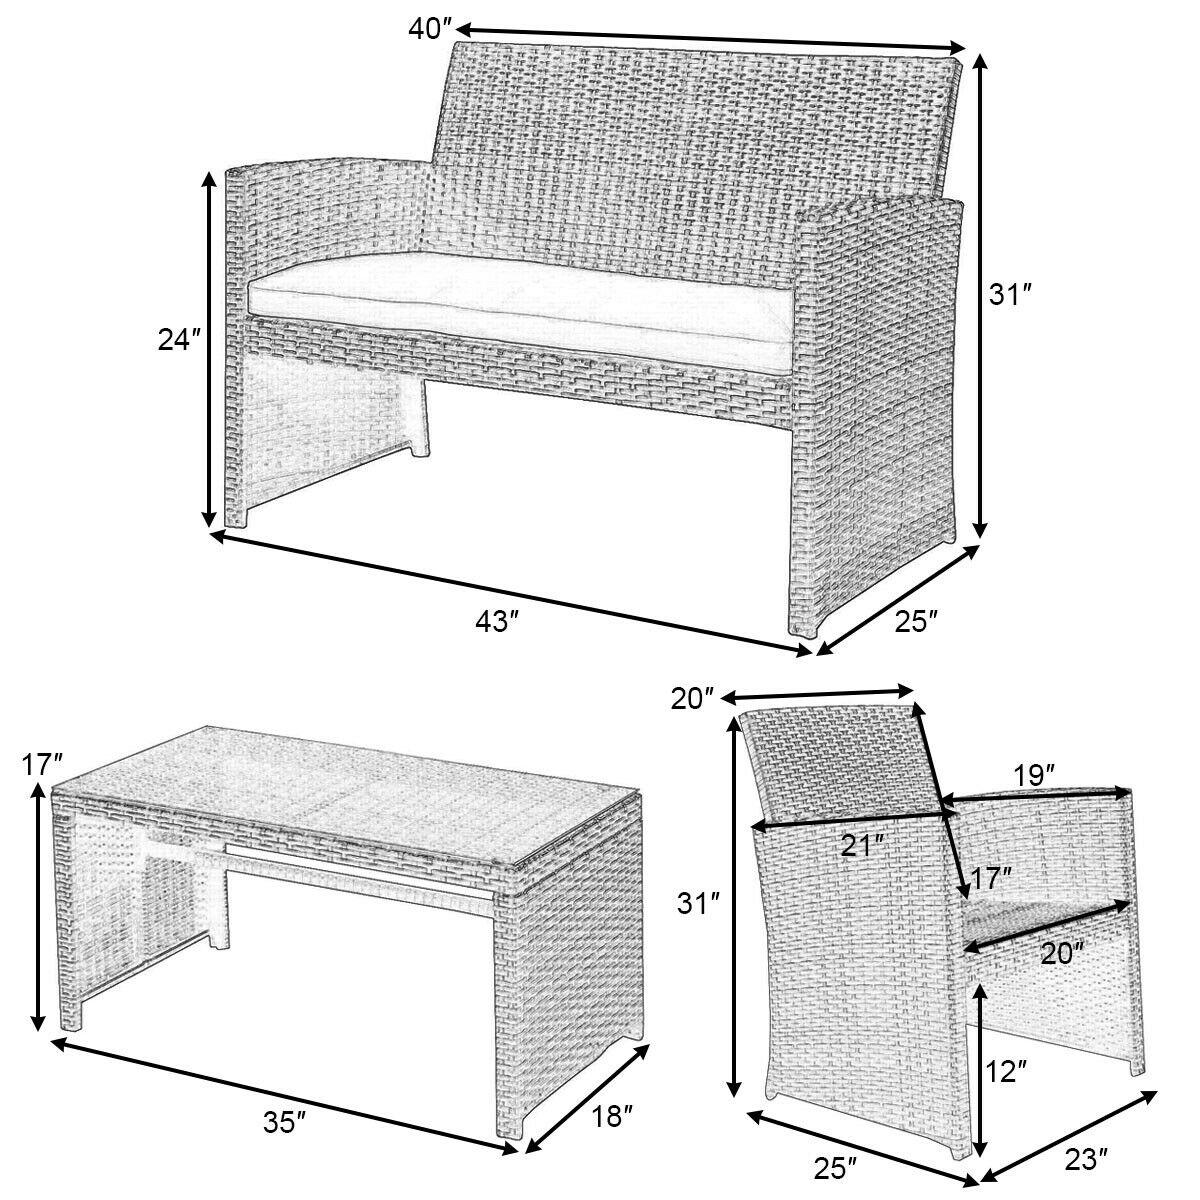 4 pcs Patio Garden Wicker Rattan Cushioned Sofa Set